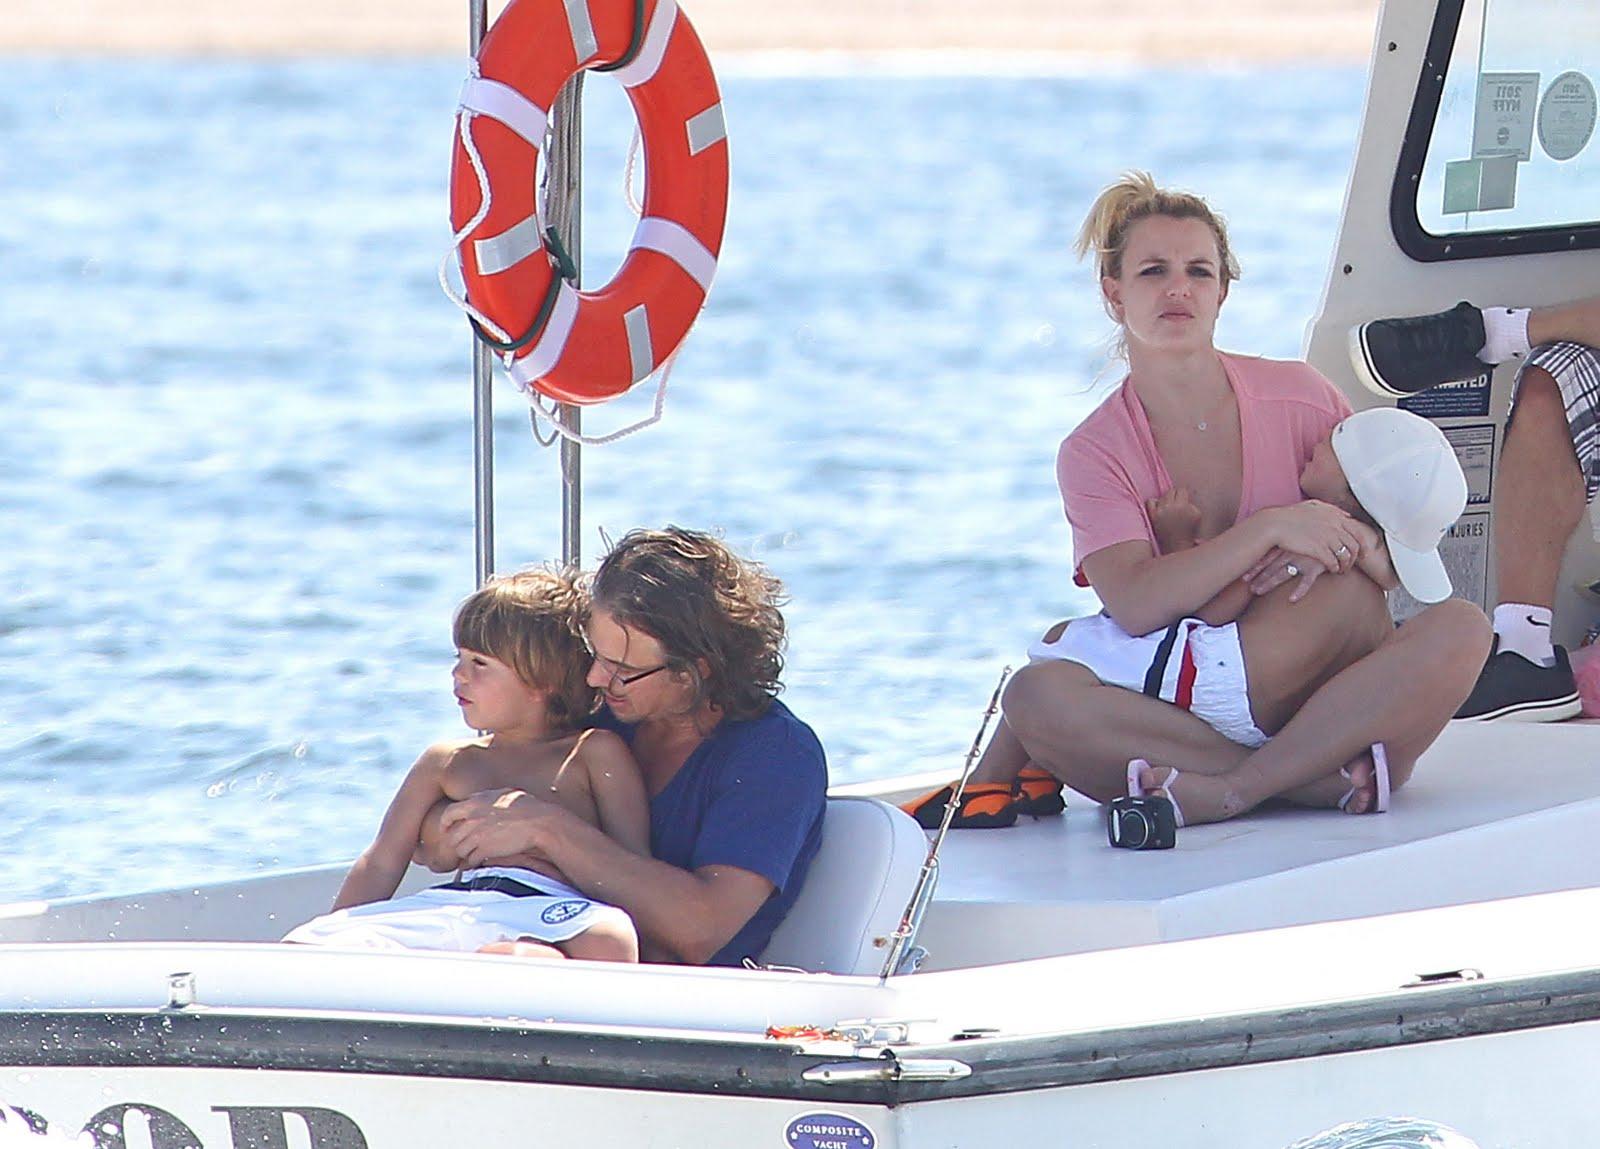 http://2.bp.blogspot.com/-uViqAYjQgP8/Tjwvr3kLQeI/AAAAAAAAC6A/cYHrNQoc3QI/s1600/family-boat-day-august-4+%252821%2529.jpg